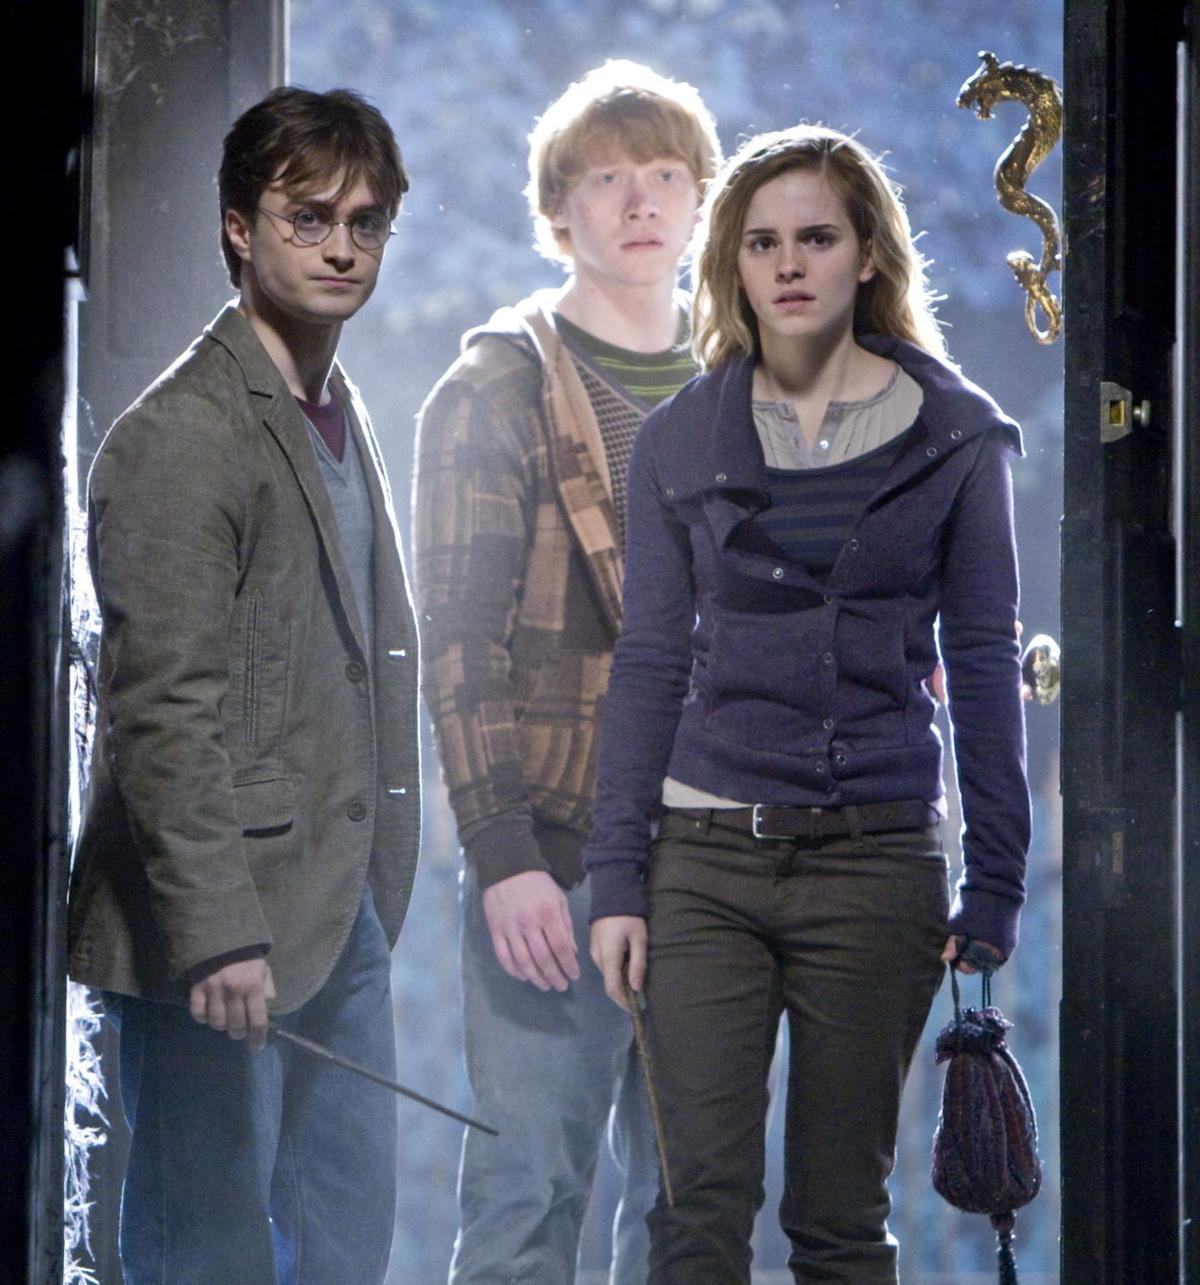 Daniel Radcliff, Rupert Grint, Emma Watson (copy)